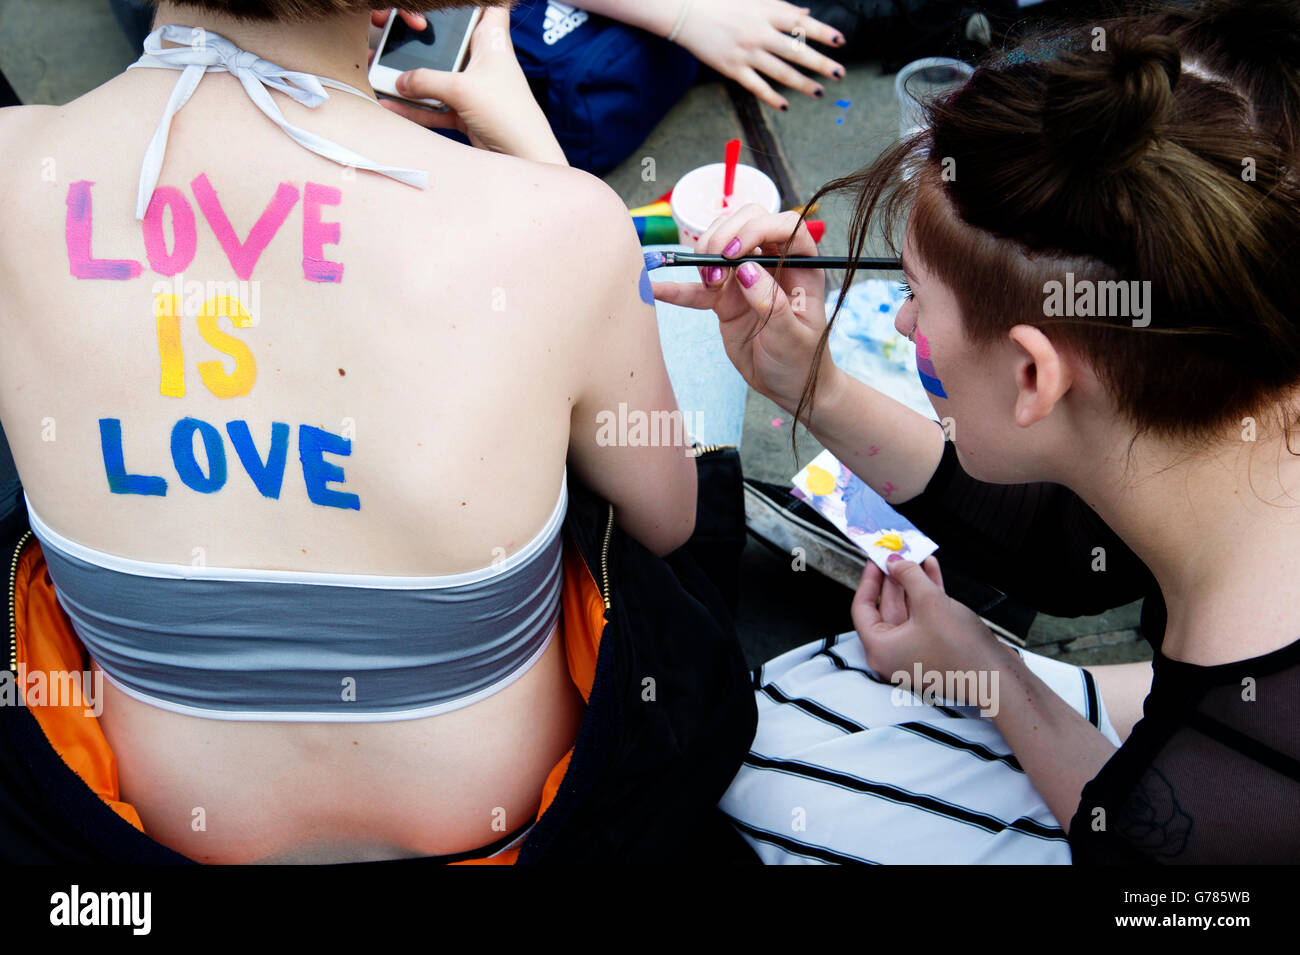 Pride in London 2016. Trafalgar Square. Body painting saying 'Love is love'. - Stock Image